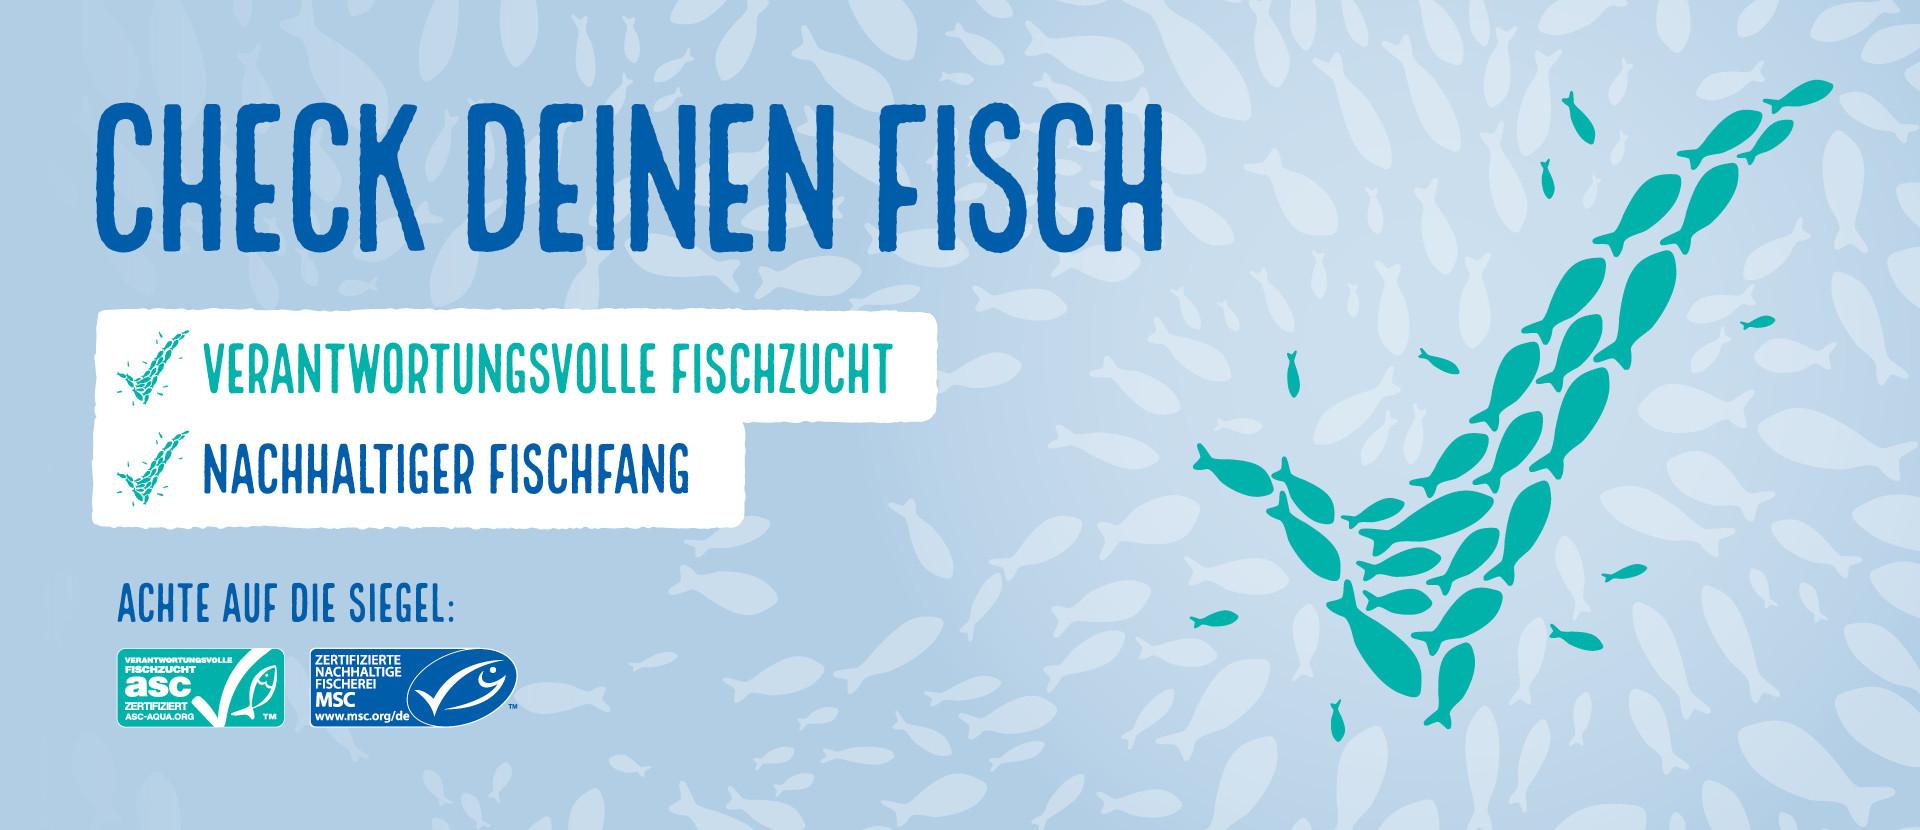 Kampagnenvisual MSC und ASC zertifizierten Fisch